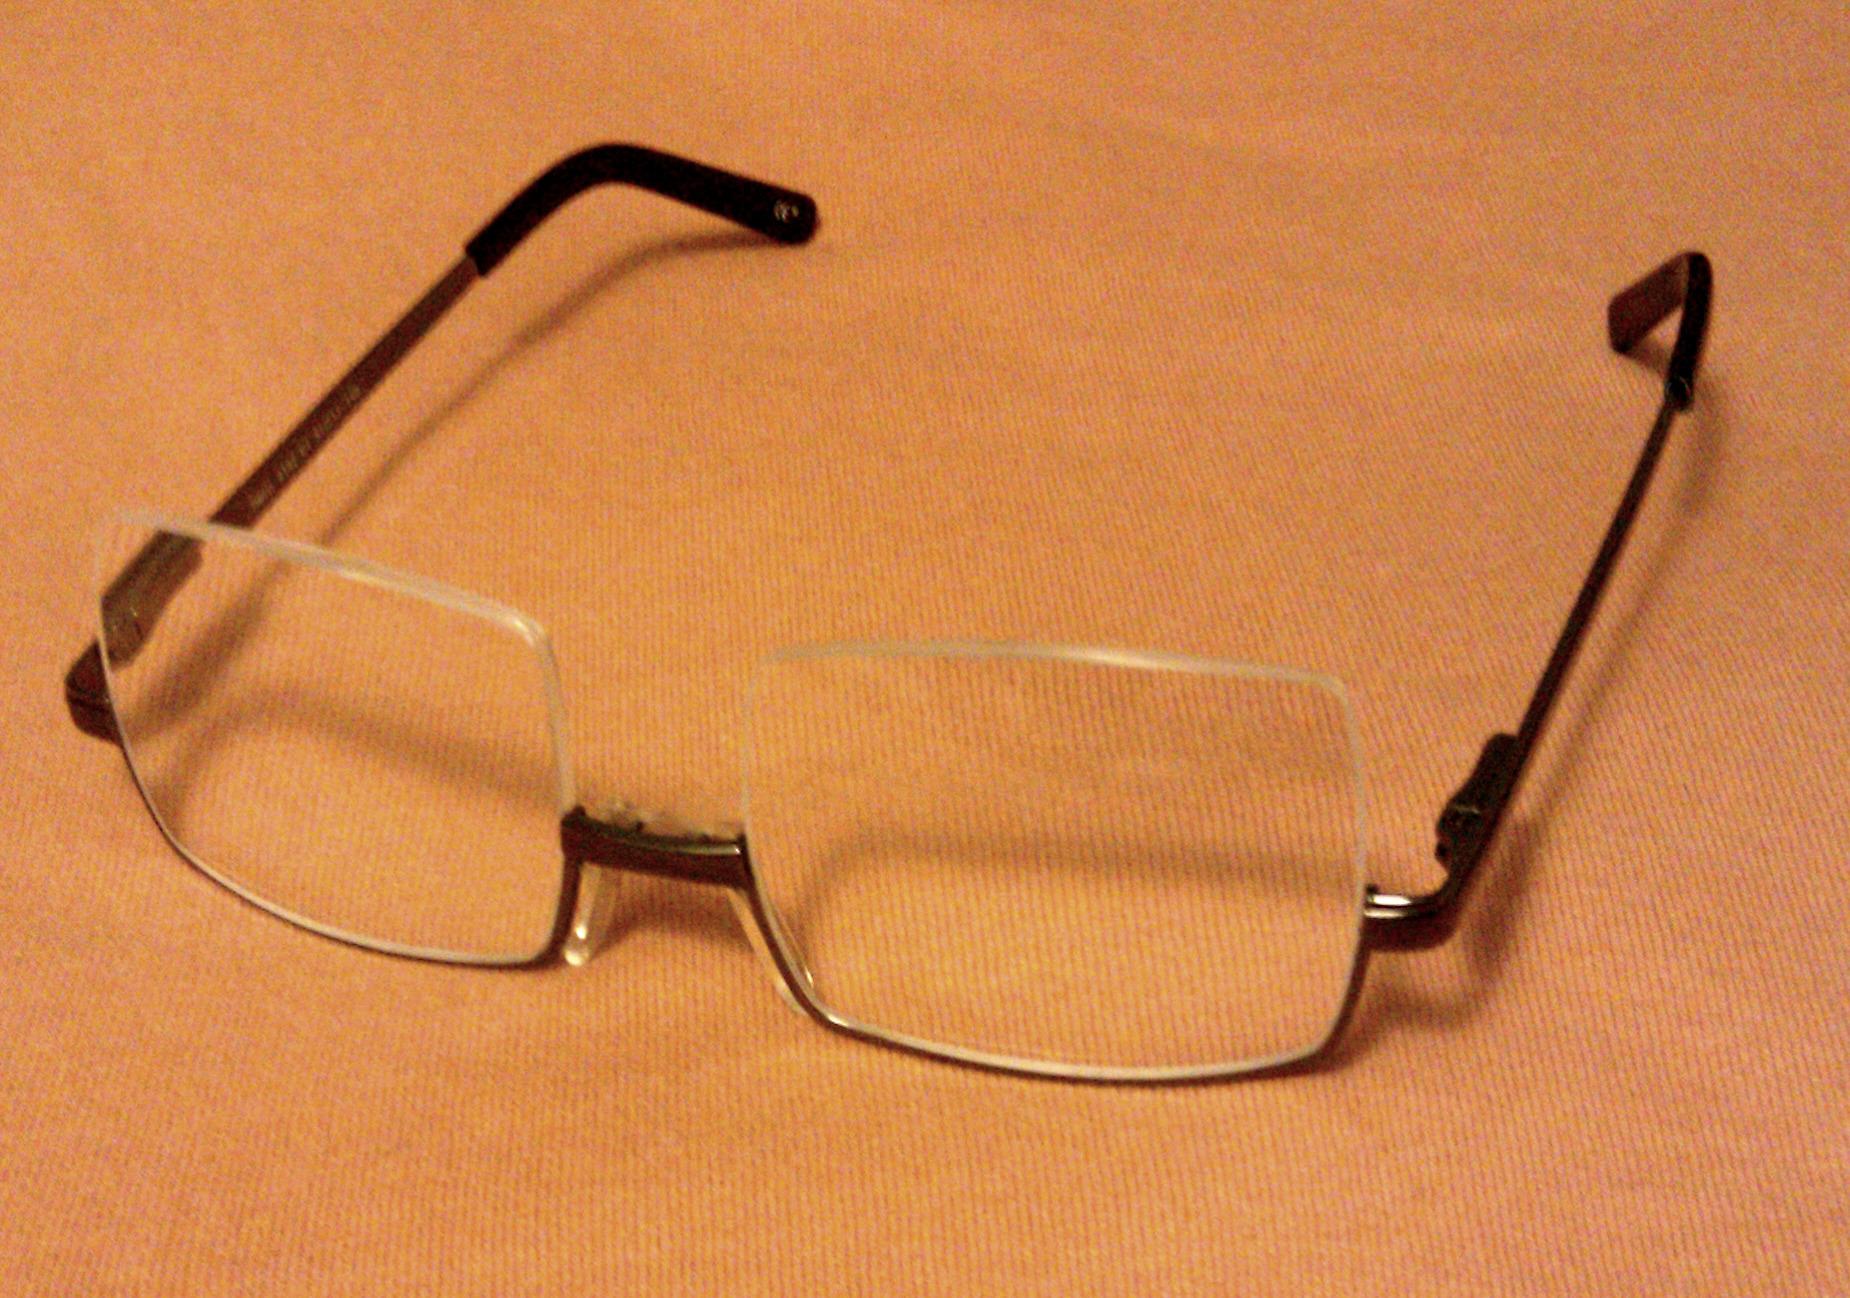 30b6a01682 File Billiards glasses.jpg - Wikipedia